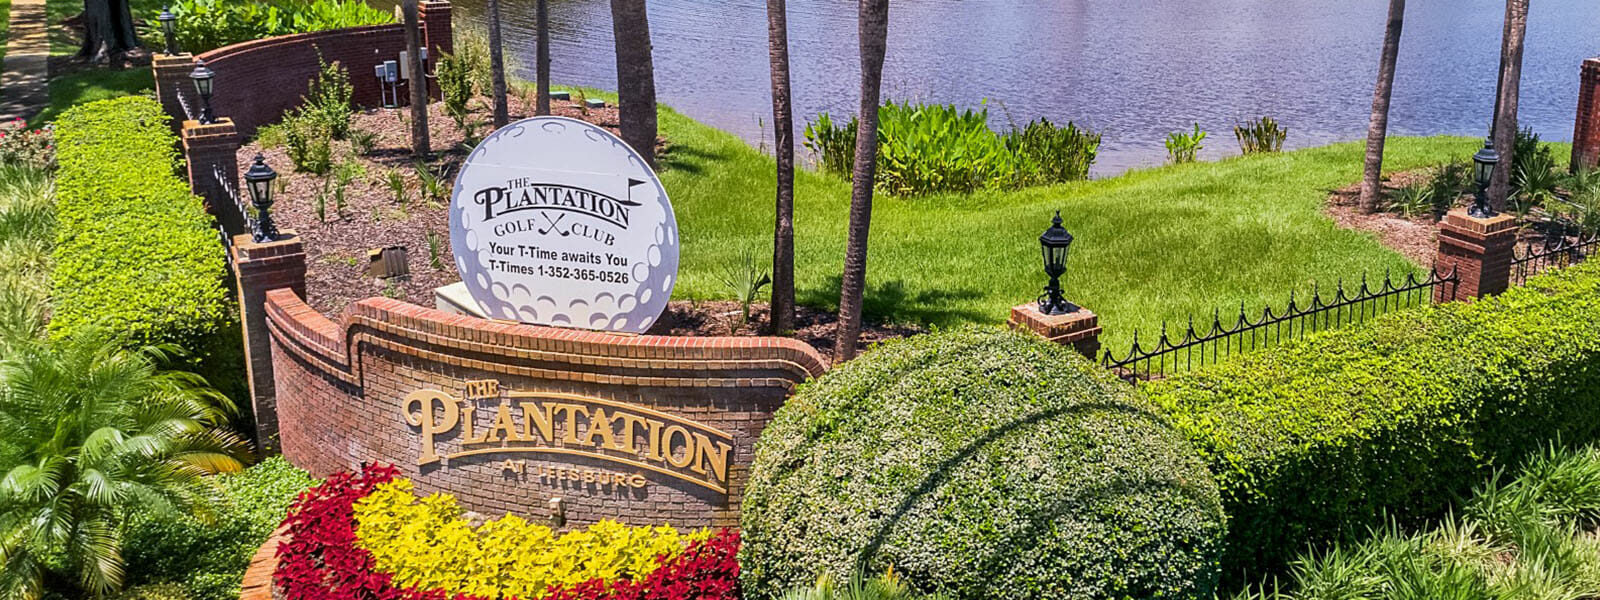 Active 55+ Community near Orlando FL   Plantation at ...